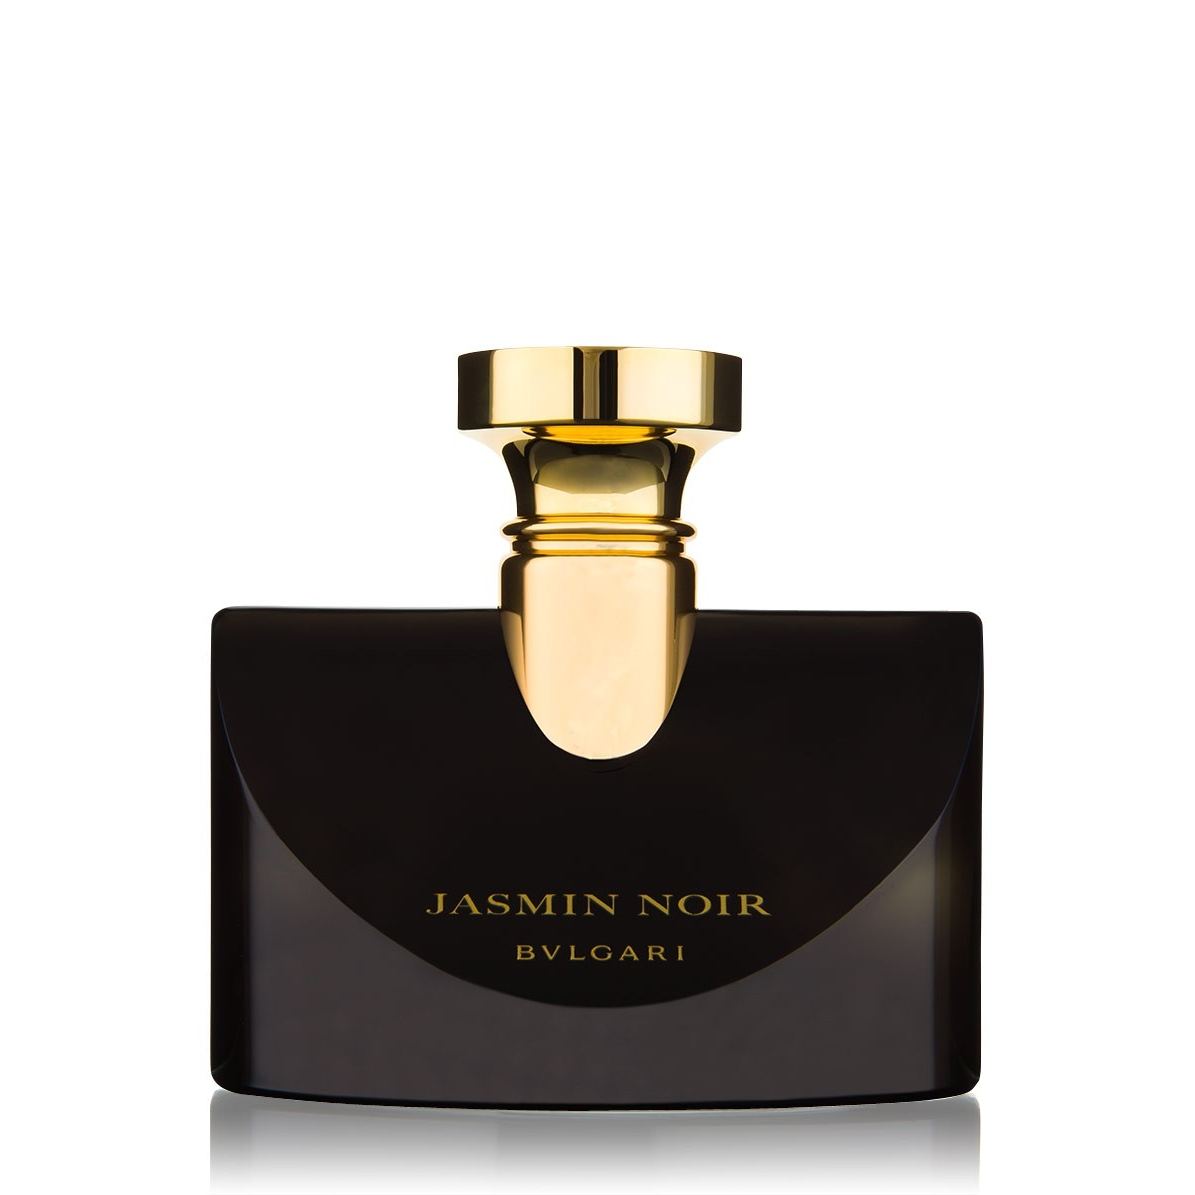 Bulgari Jasmin Noir eau de parfum spray donna 50 ml